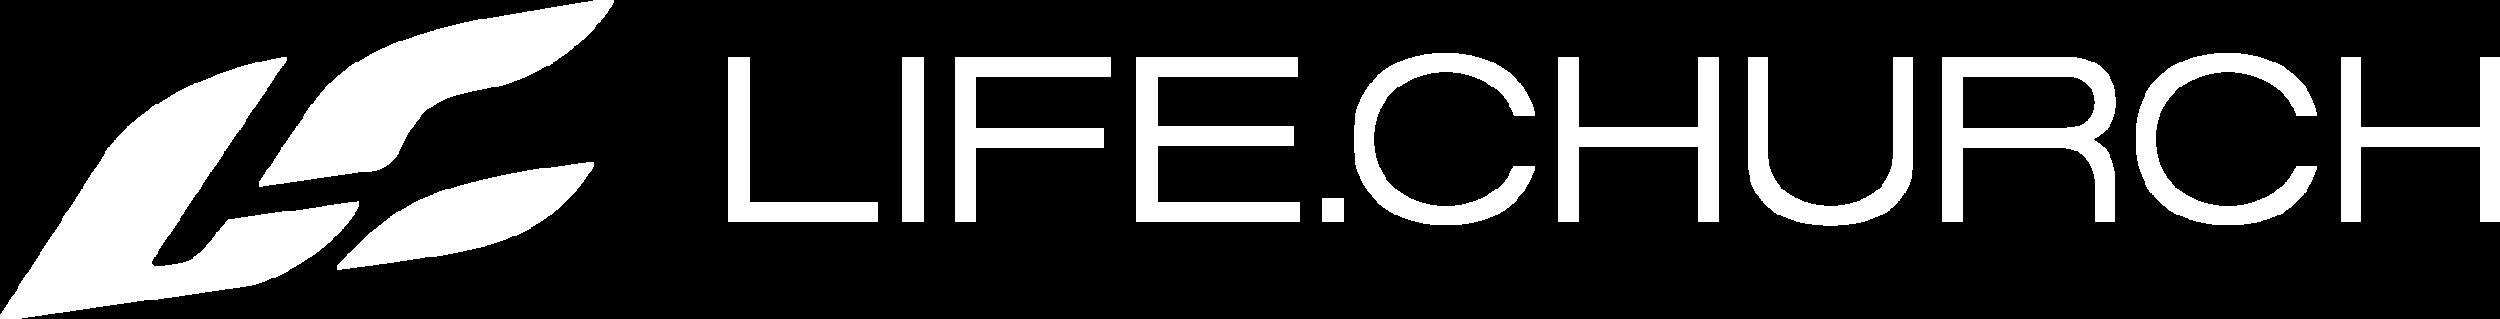 LifeChurch_Logo.png